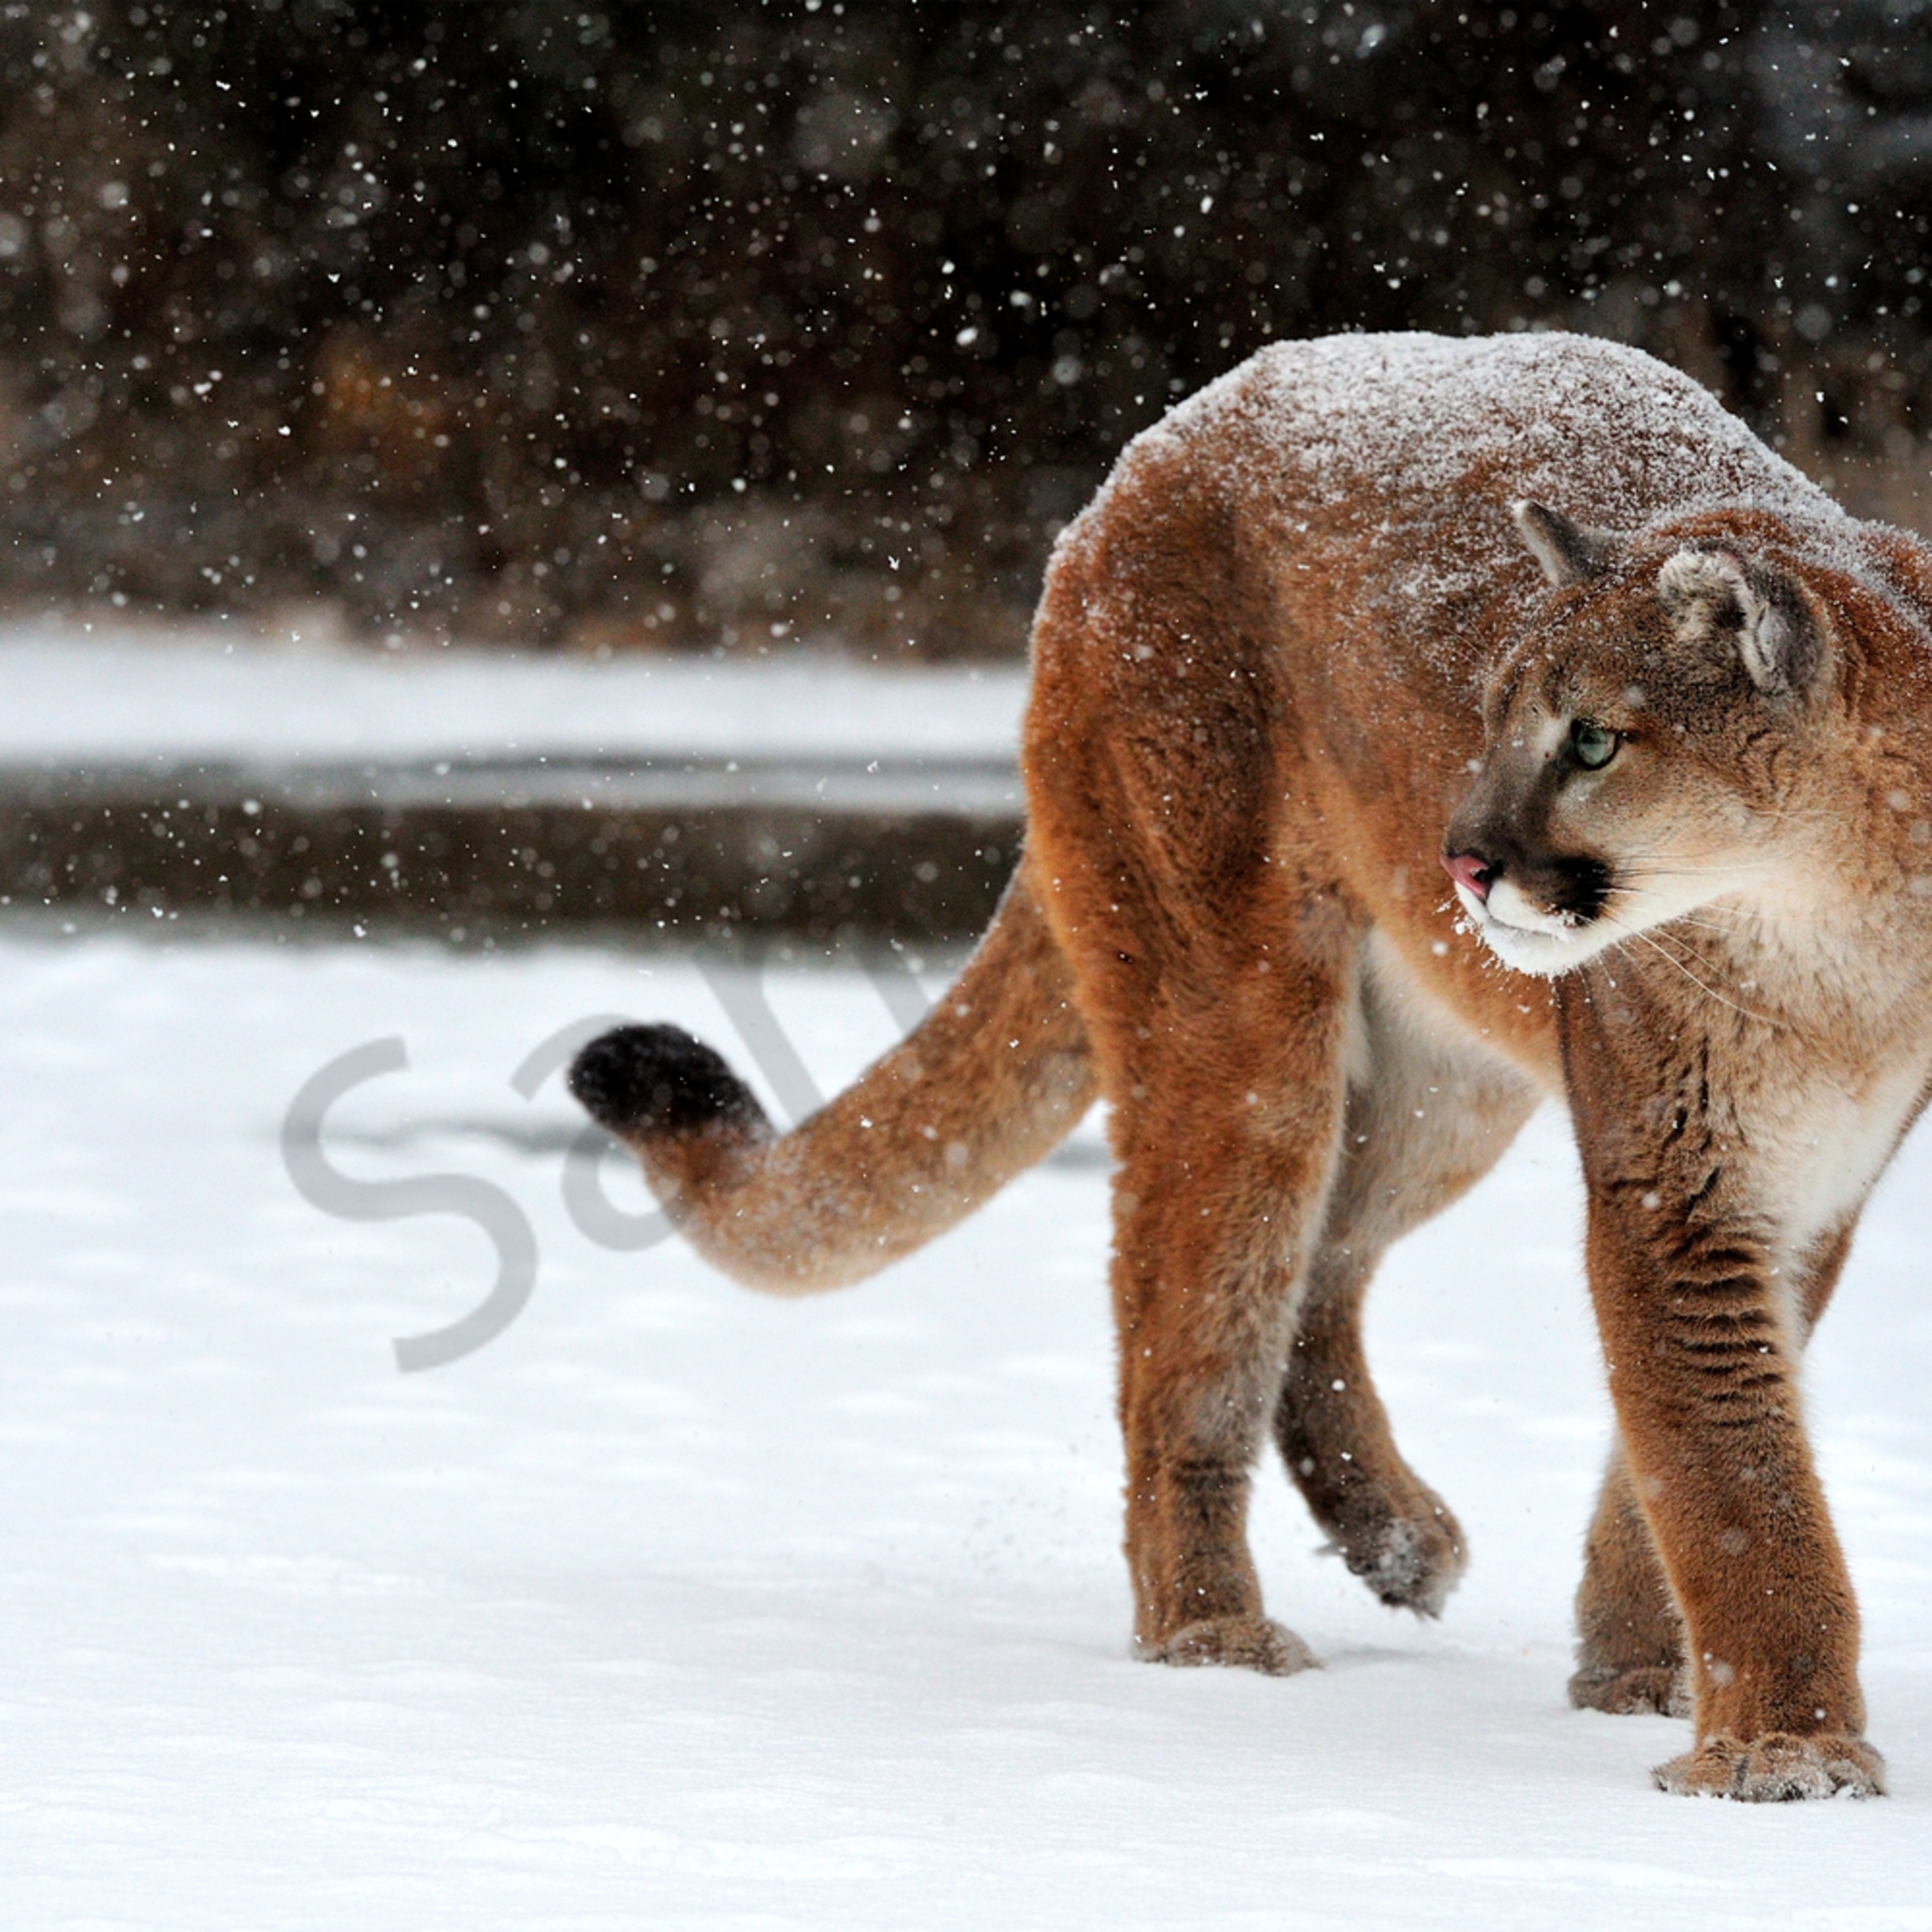 Cougar in snow xntb00